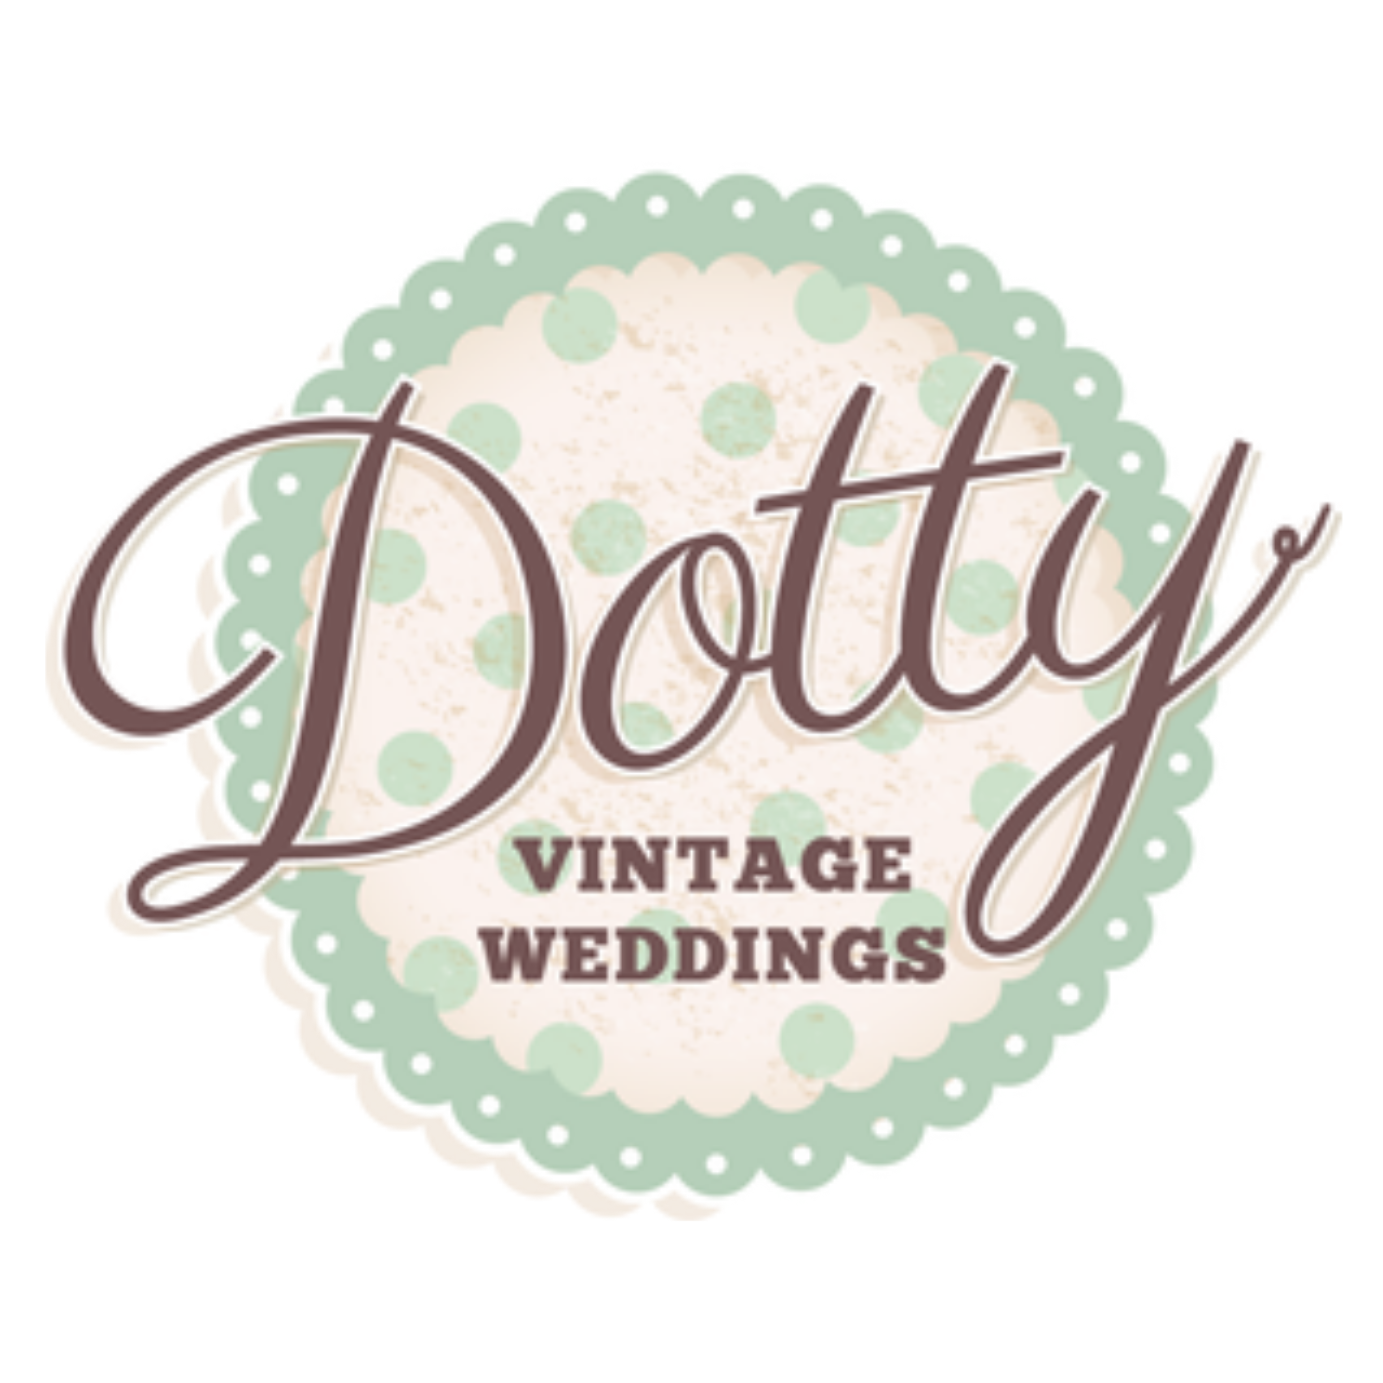 Dotty Vintage Weddings Blog - Spring Bridal Shoot - Emily Hankins Cakes